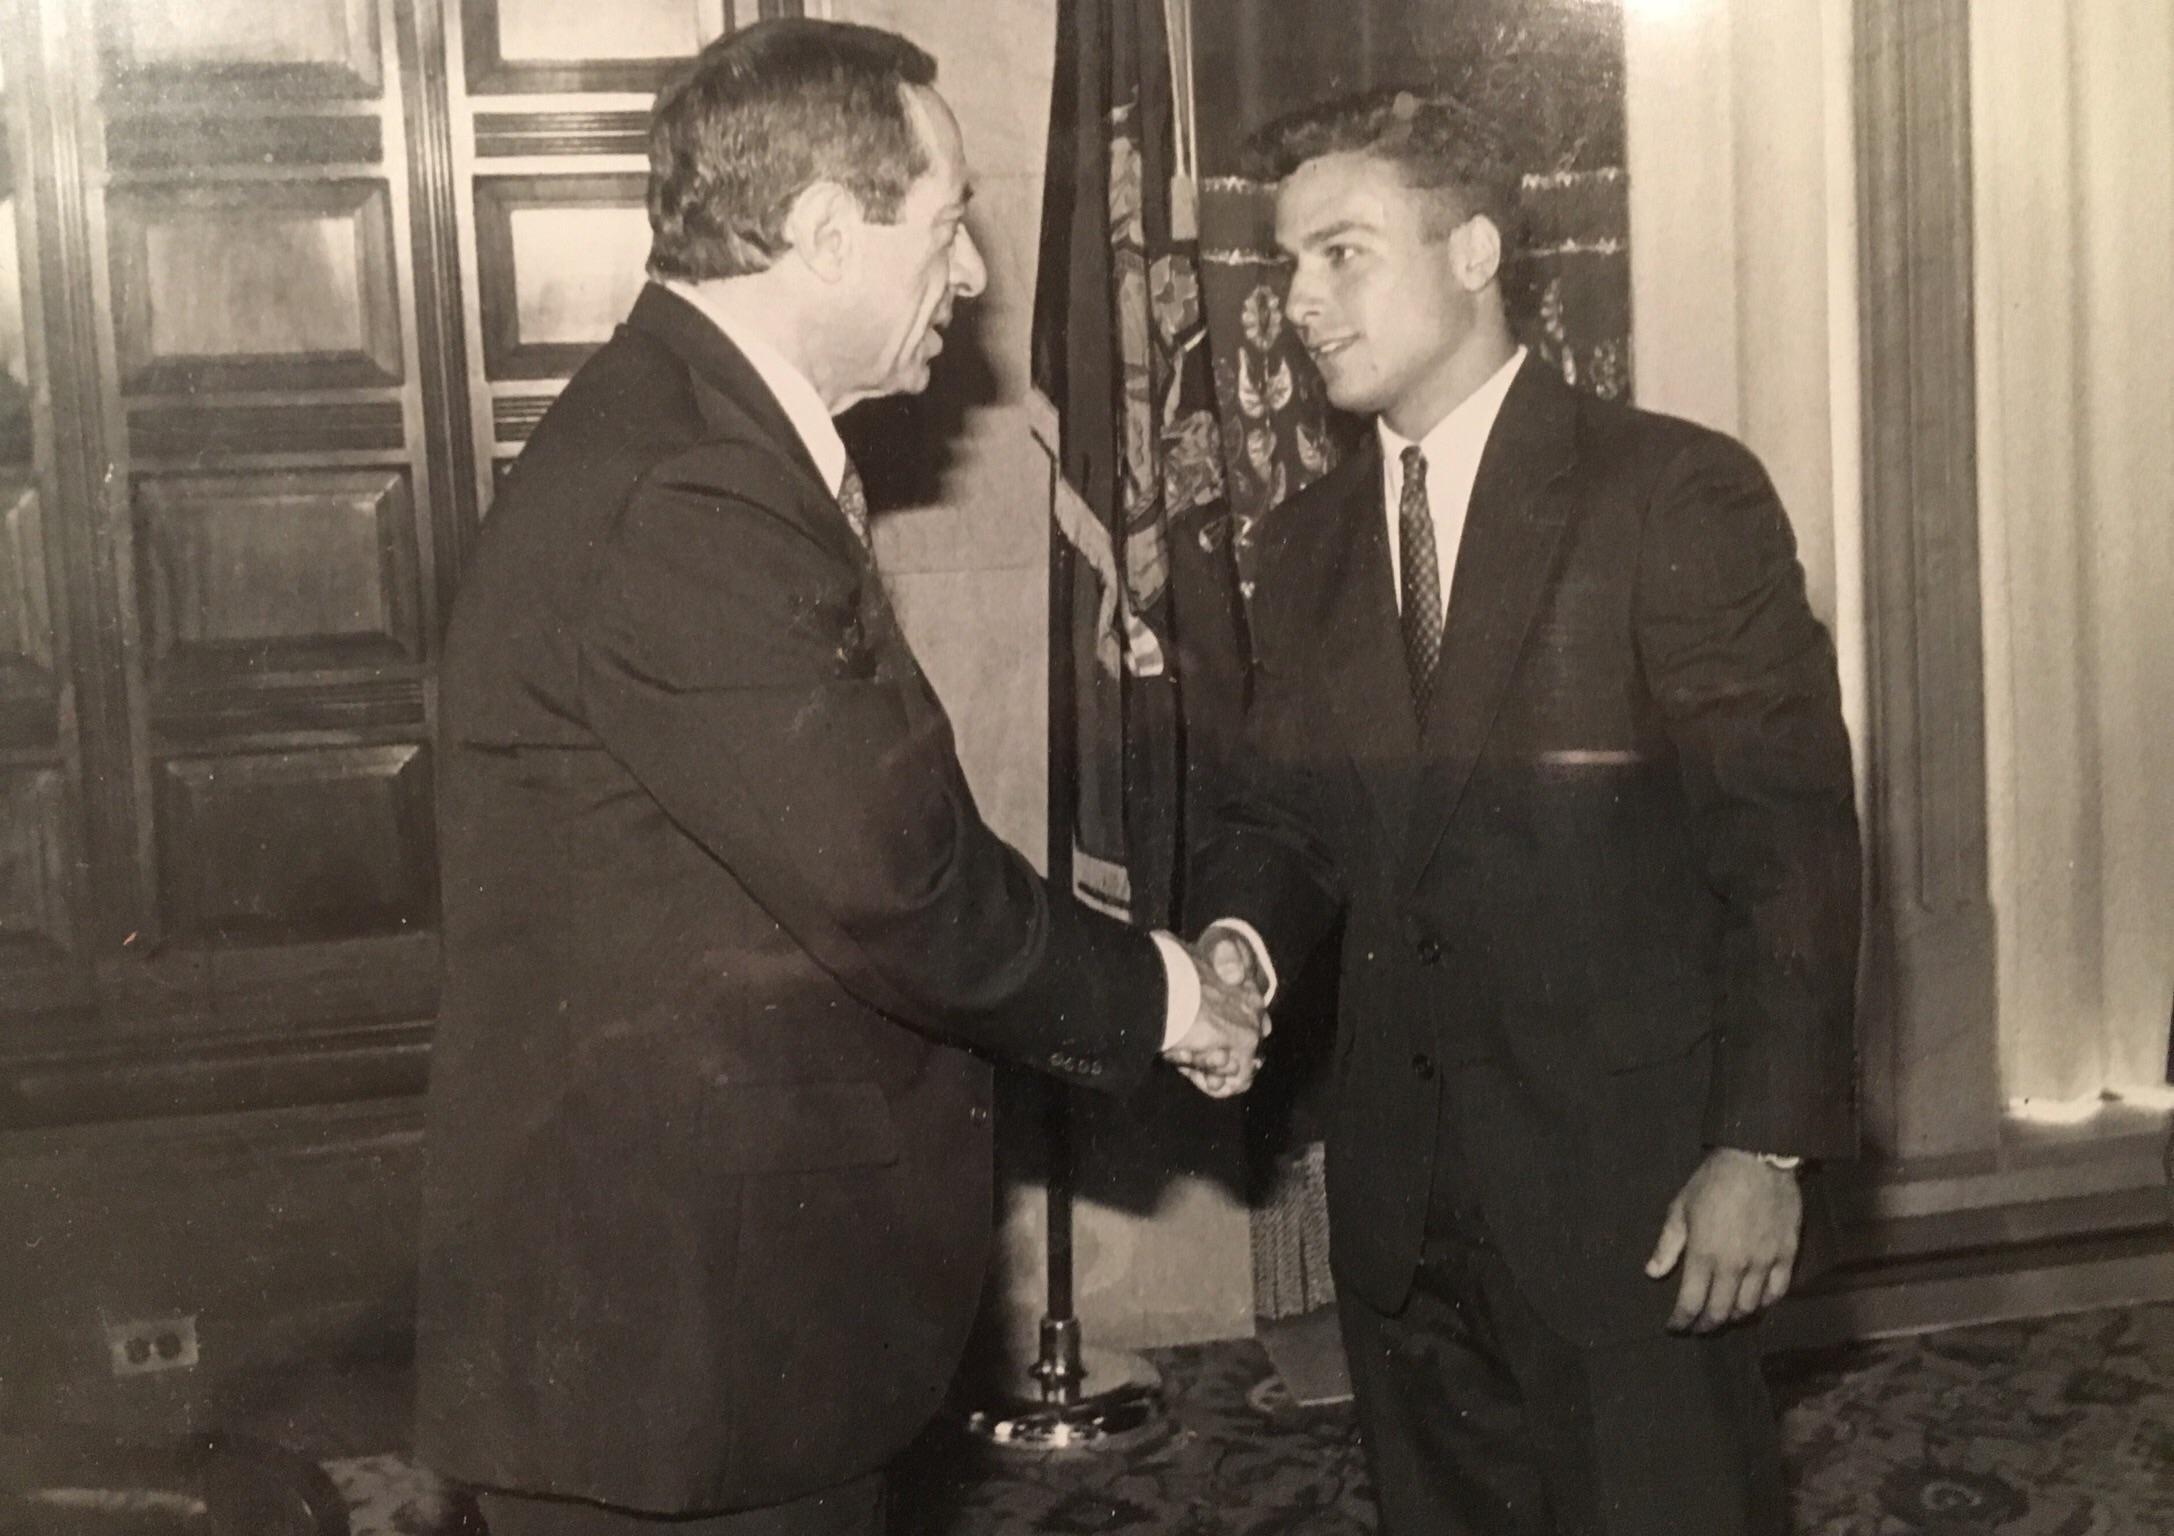 Meeting Former NY Governor Mario Cuomo 1991 OldSchoolCool